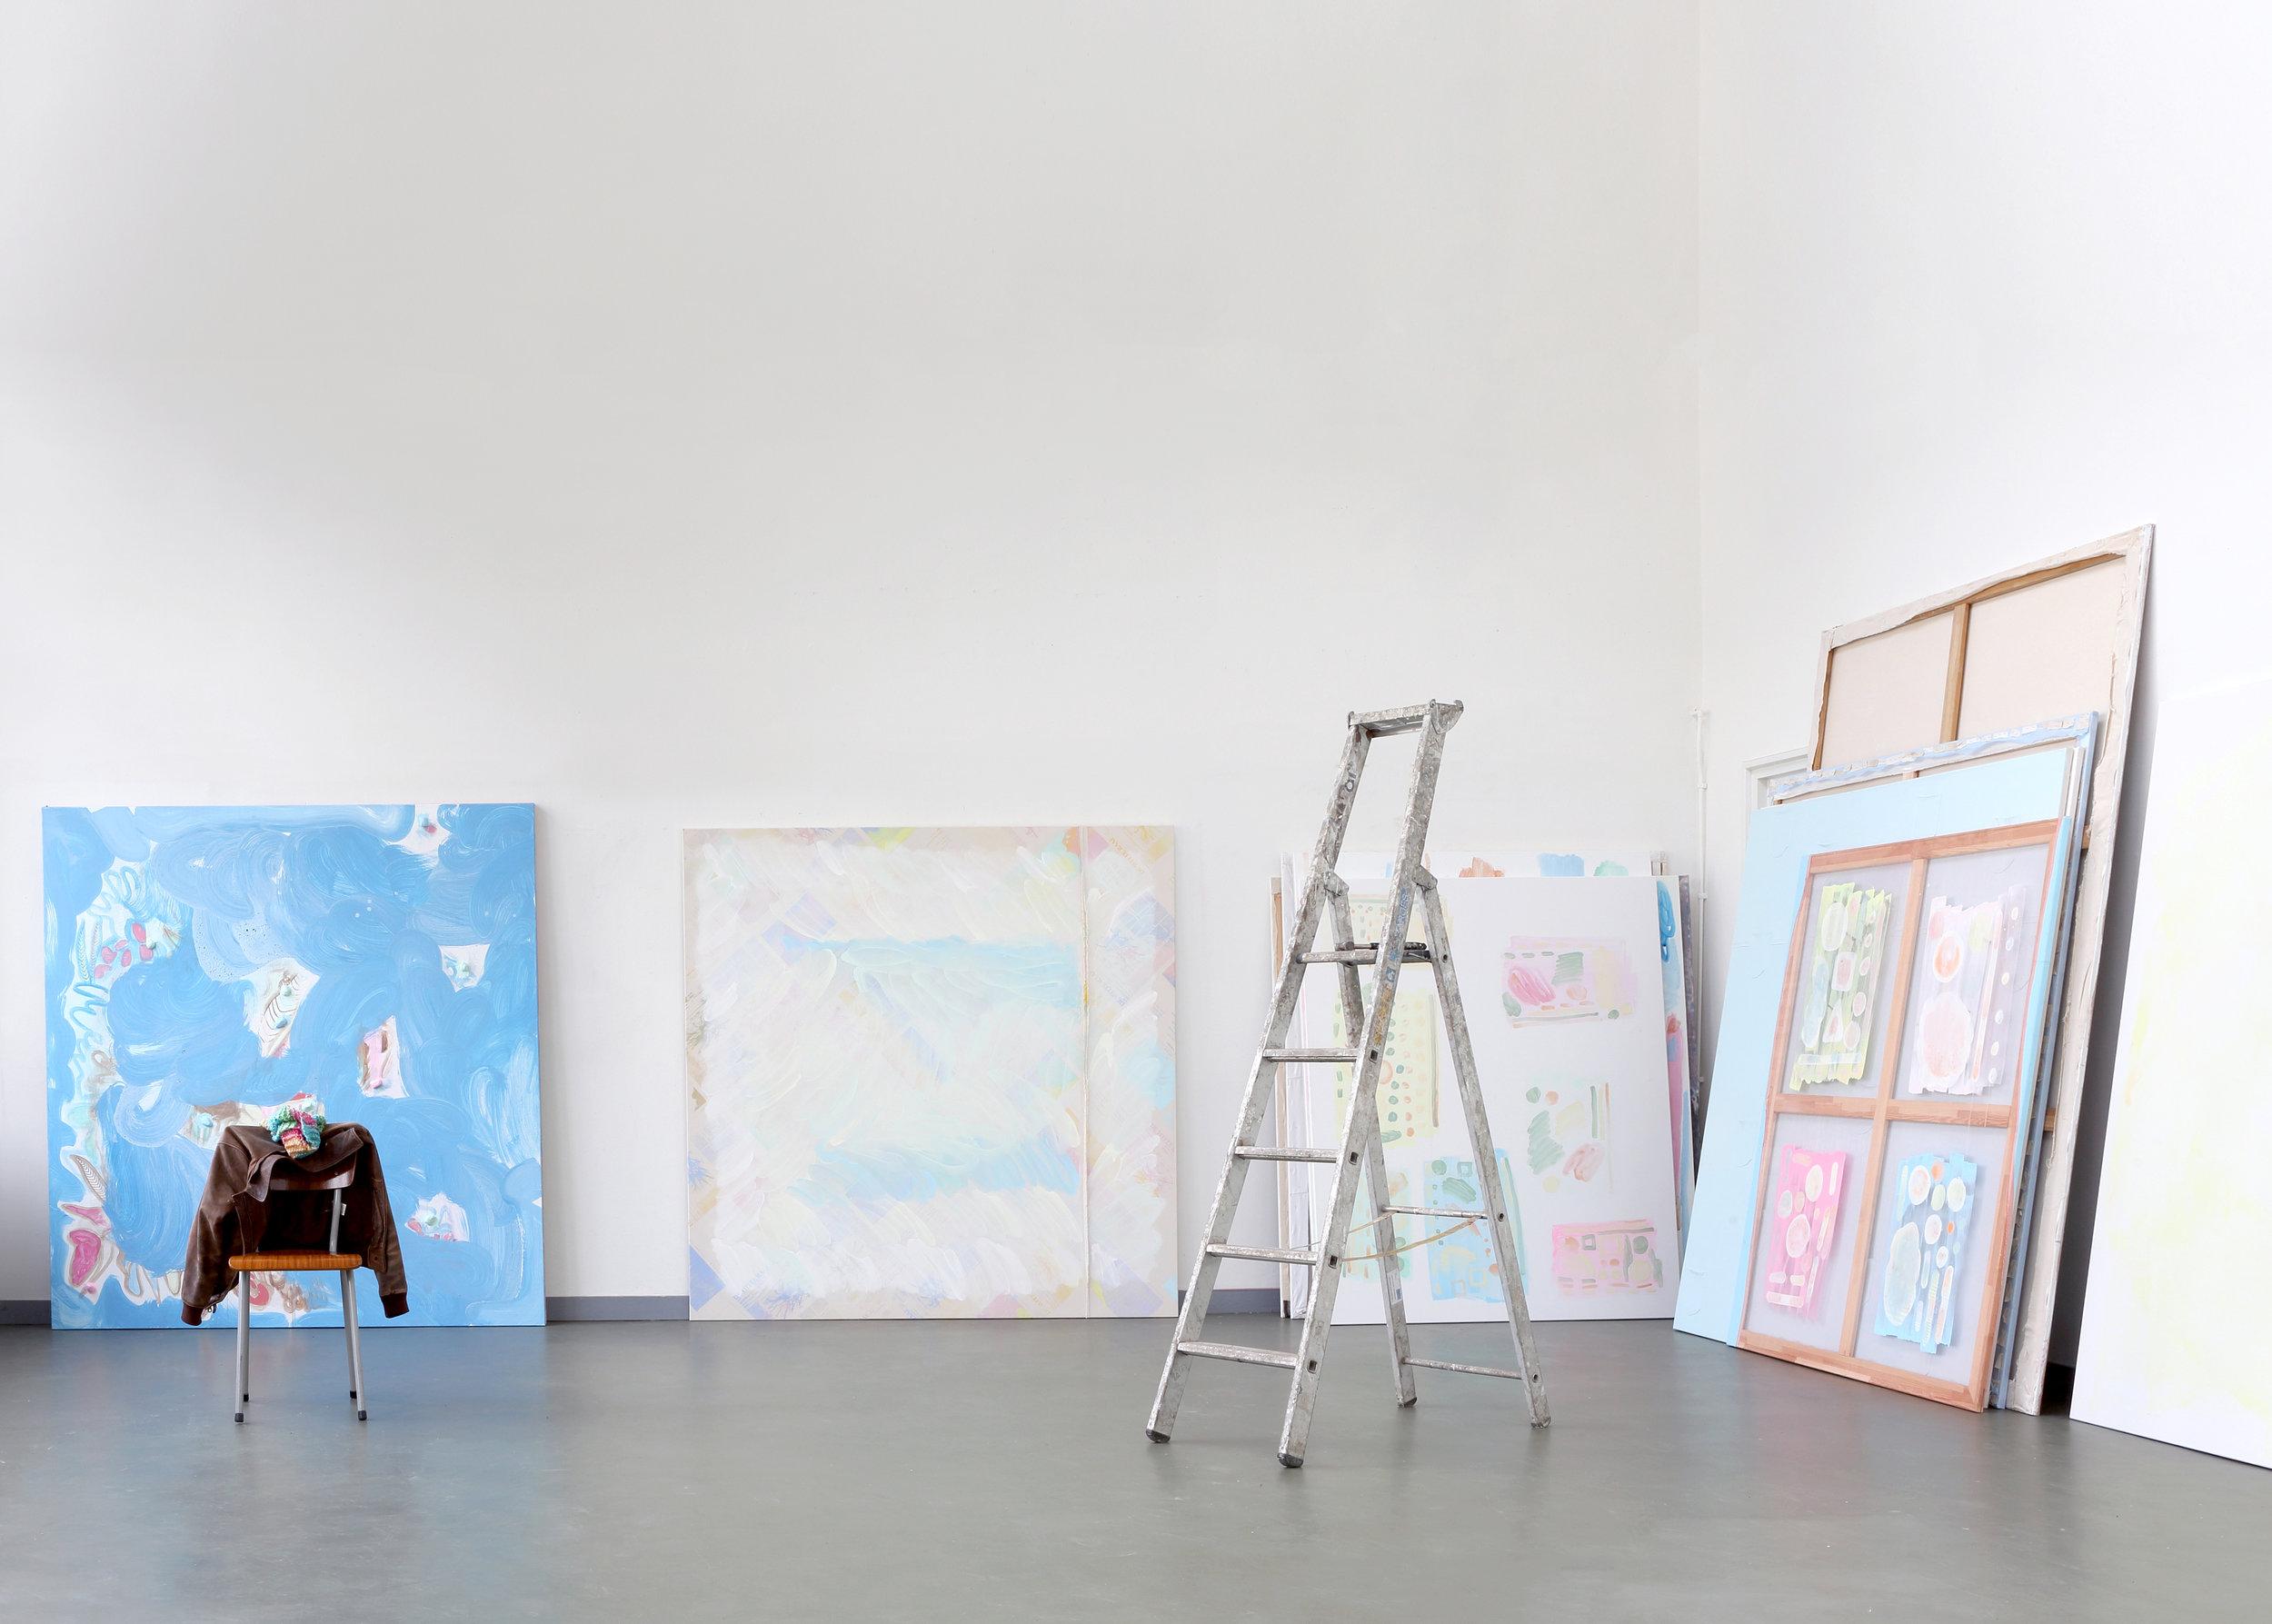 Paintings 2017 - 2018, Egg-tempera, primers, puff-ink, silkscreenprint on canvas and transparant canvas, Various measurements, Jan van Eyck Academie, 2018